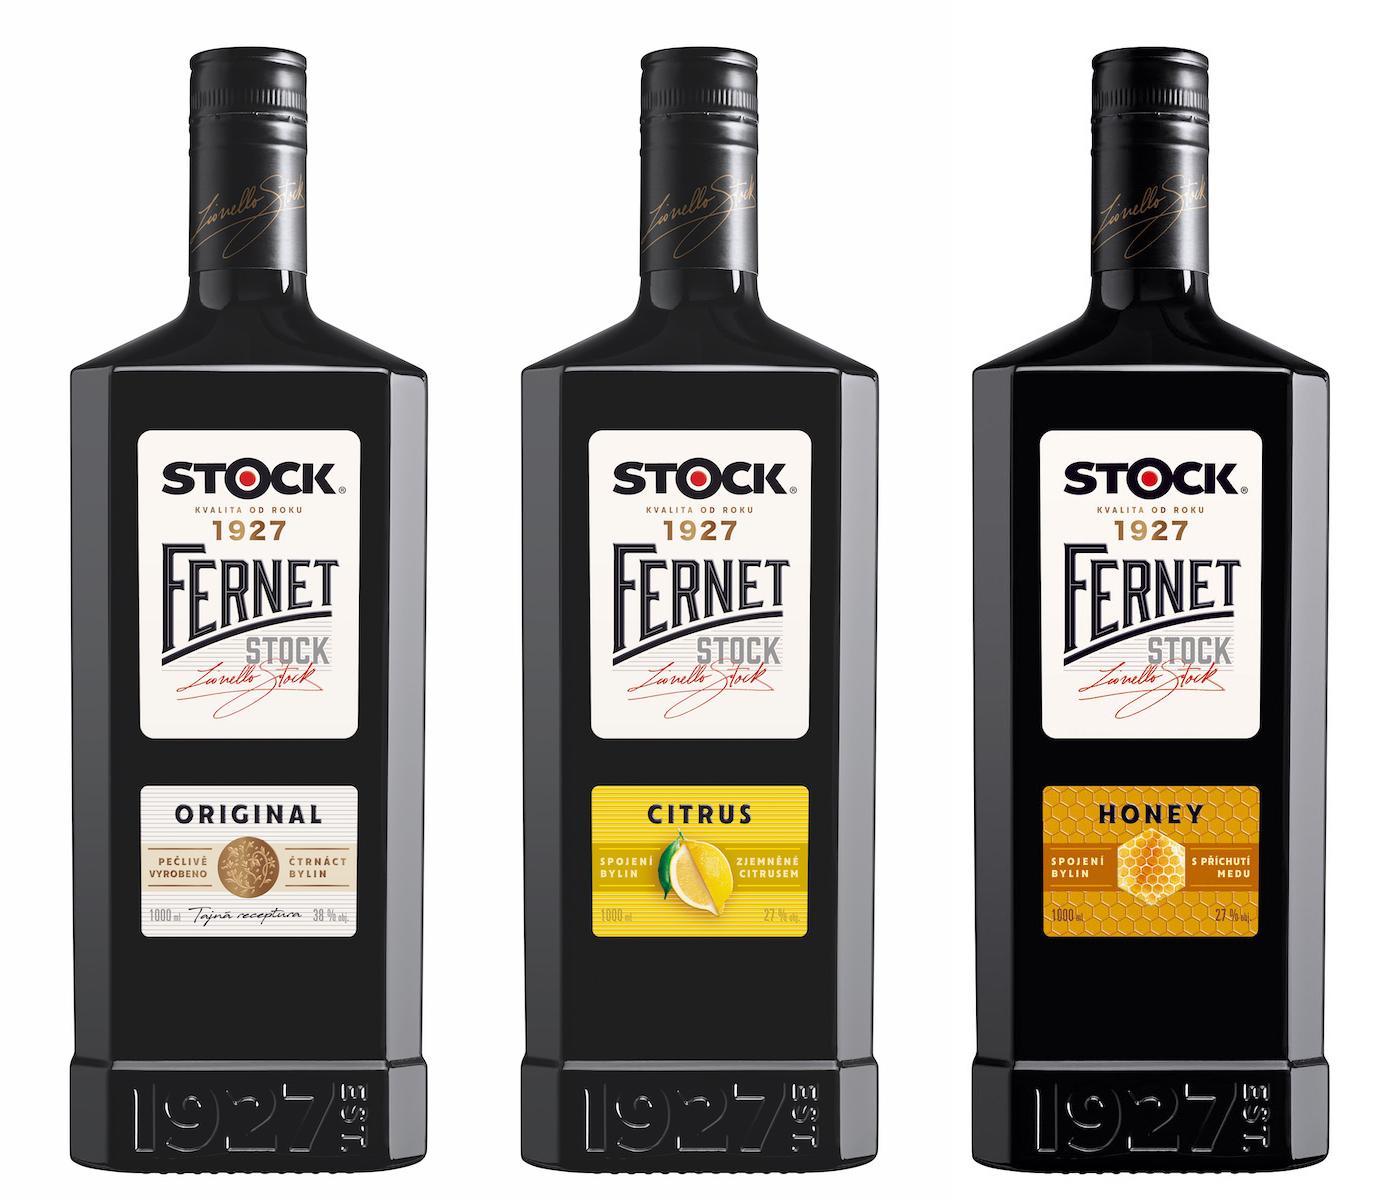 Nové lahve pro Fernet Original, Citrus a nově Honey